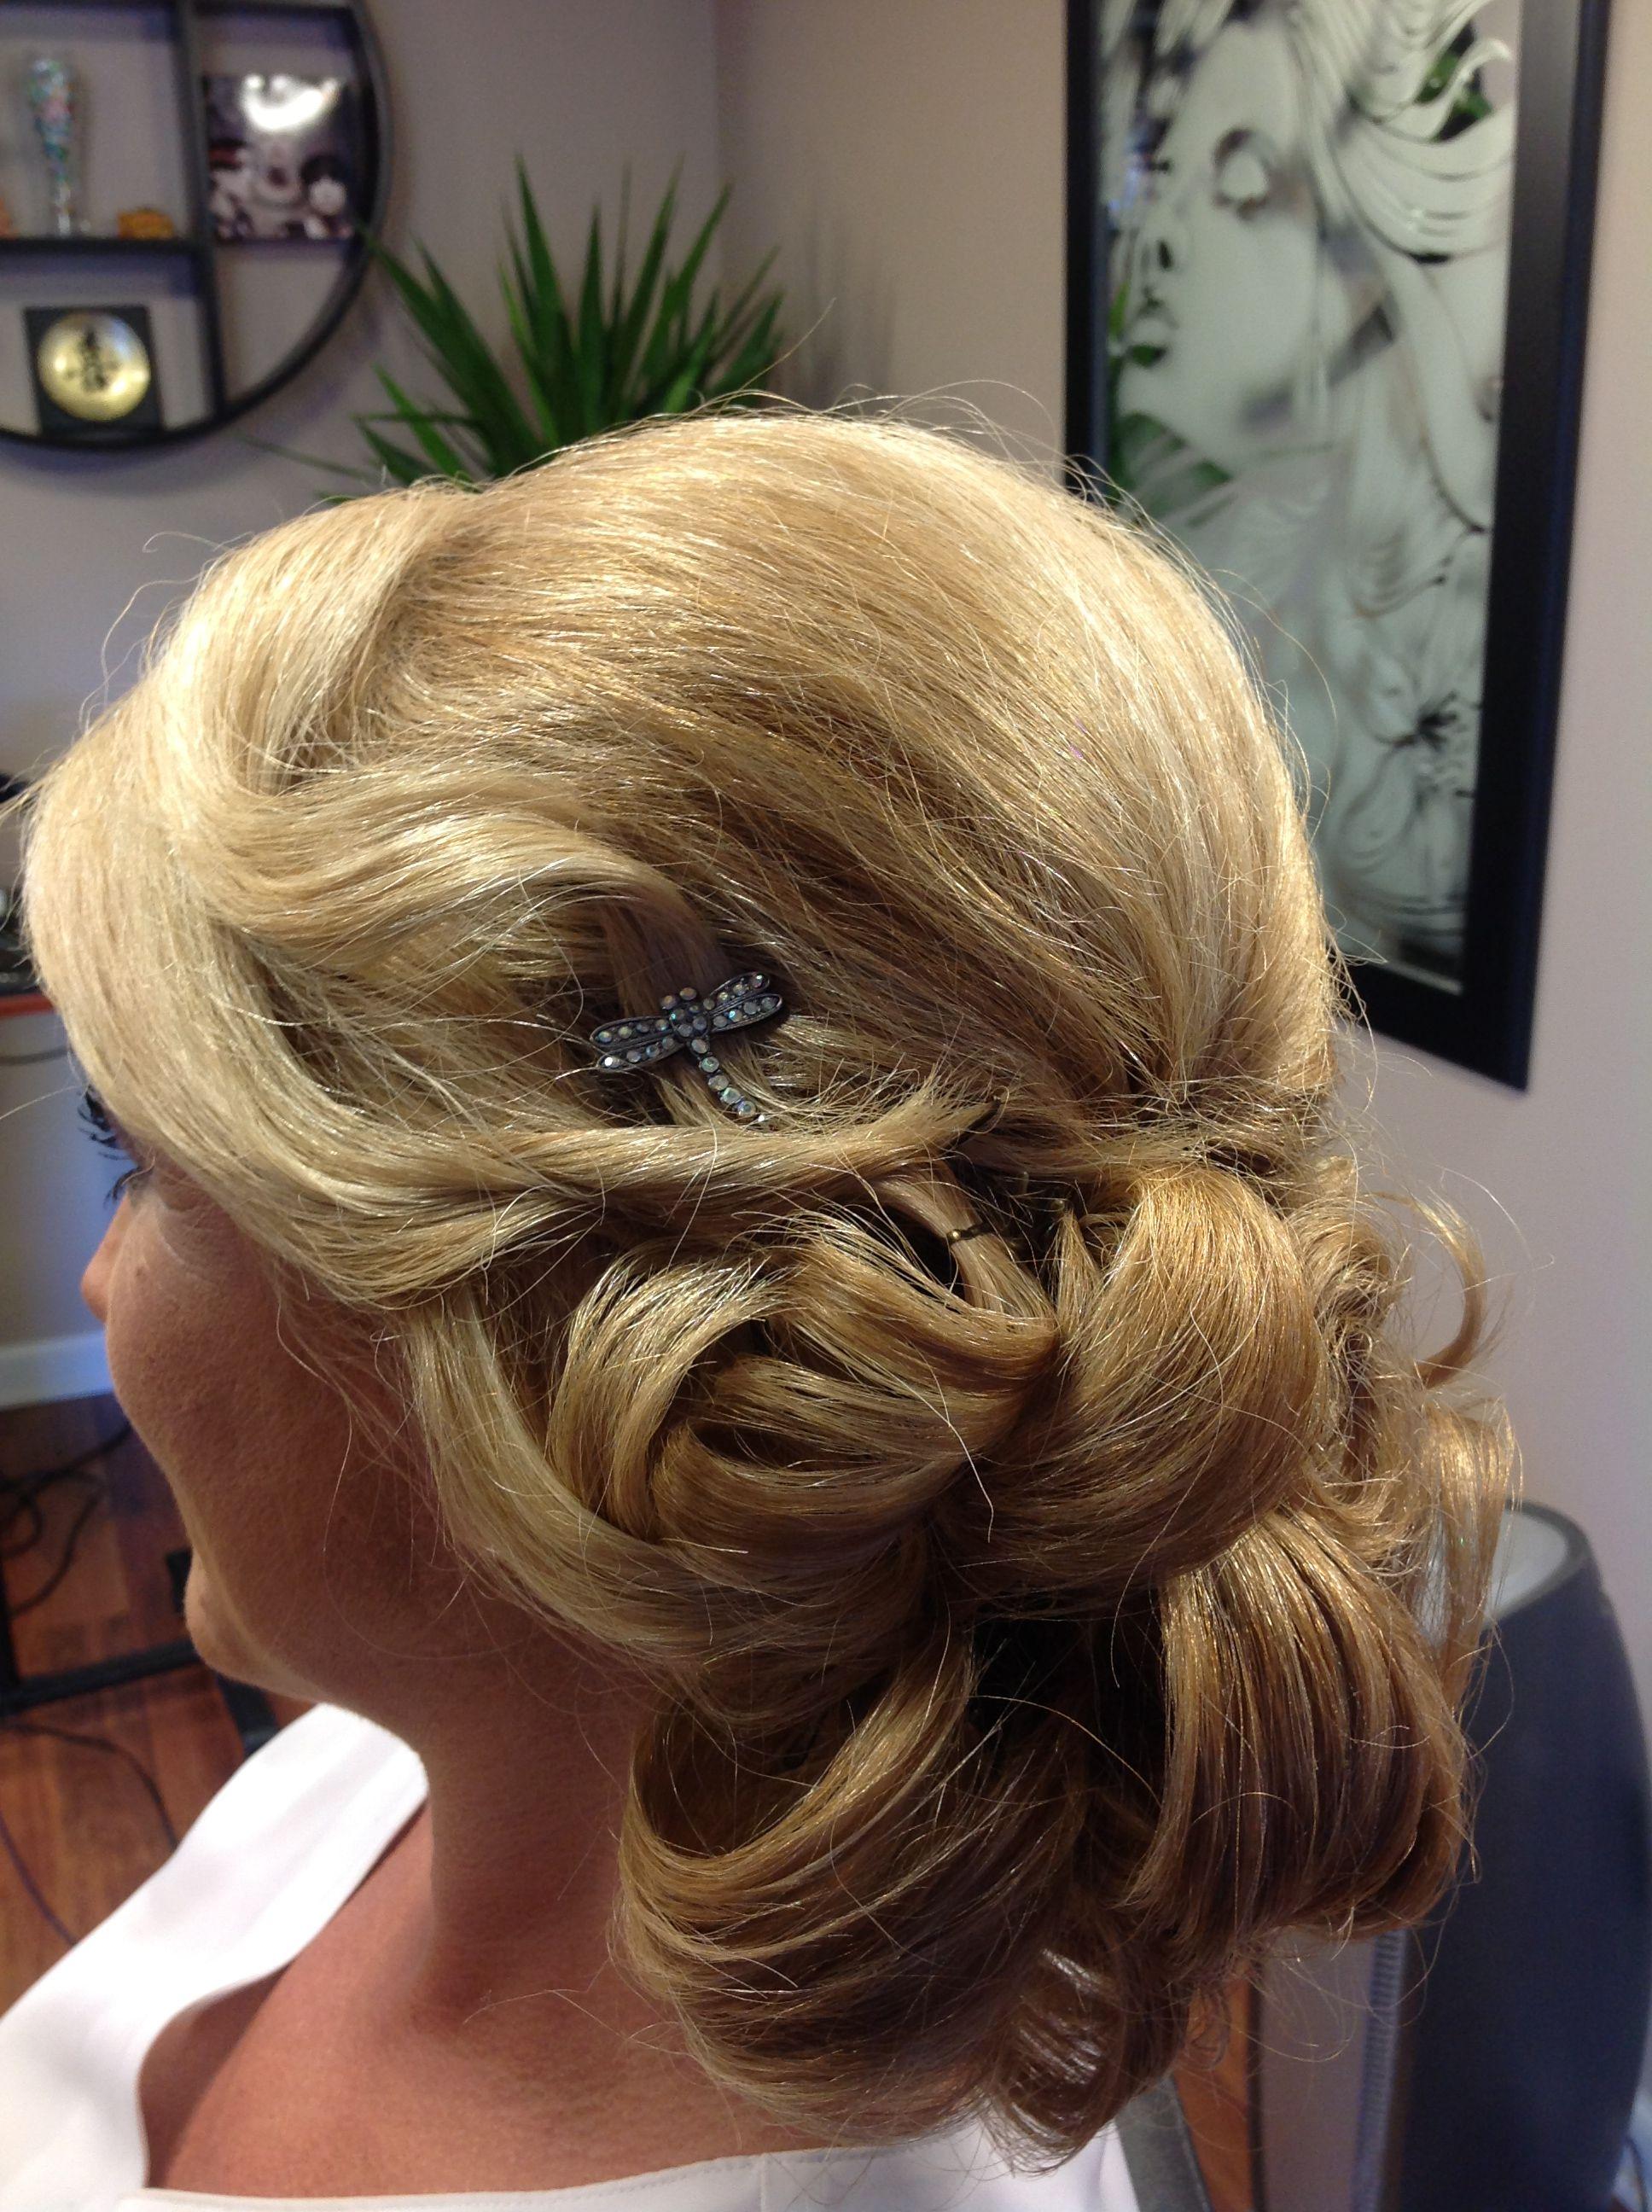 hair & make-up by salon & spa 18. 1807 n oak street, myrtle beach